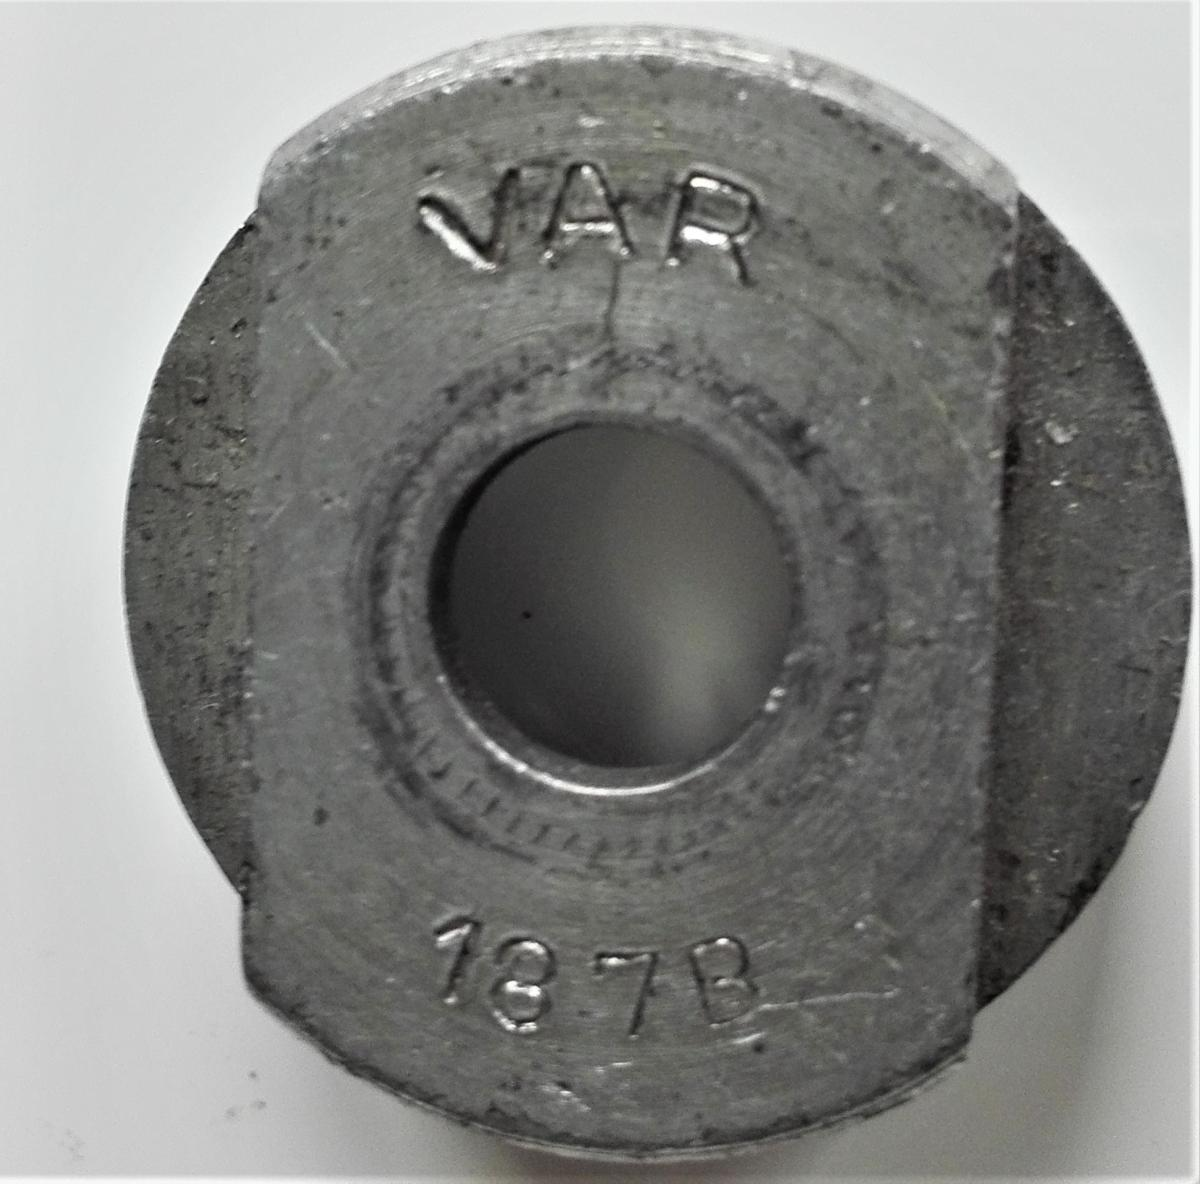 VAR Tool FREEWHEEL Remover   demonte roue libre  187 B  velo vintage